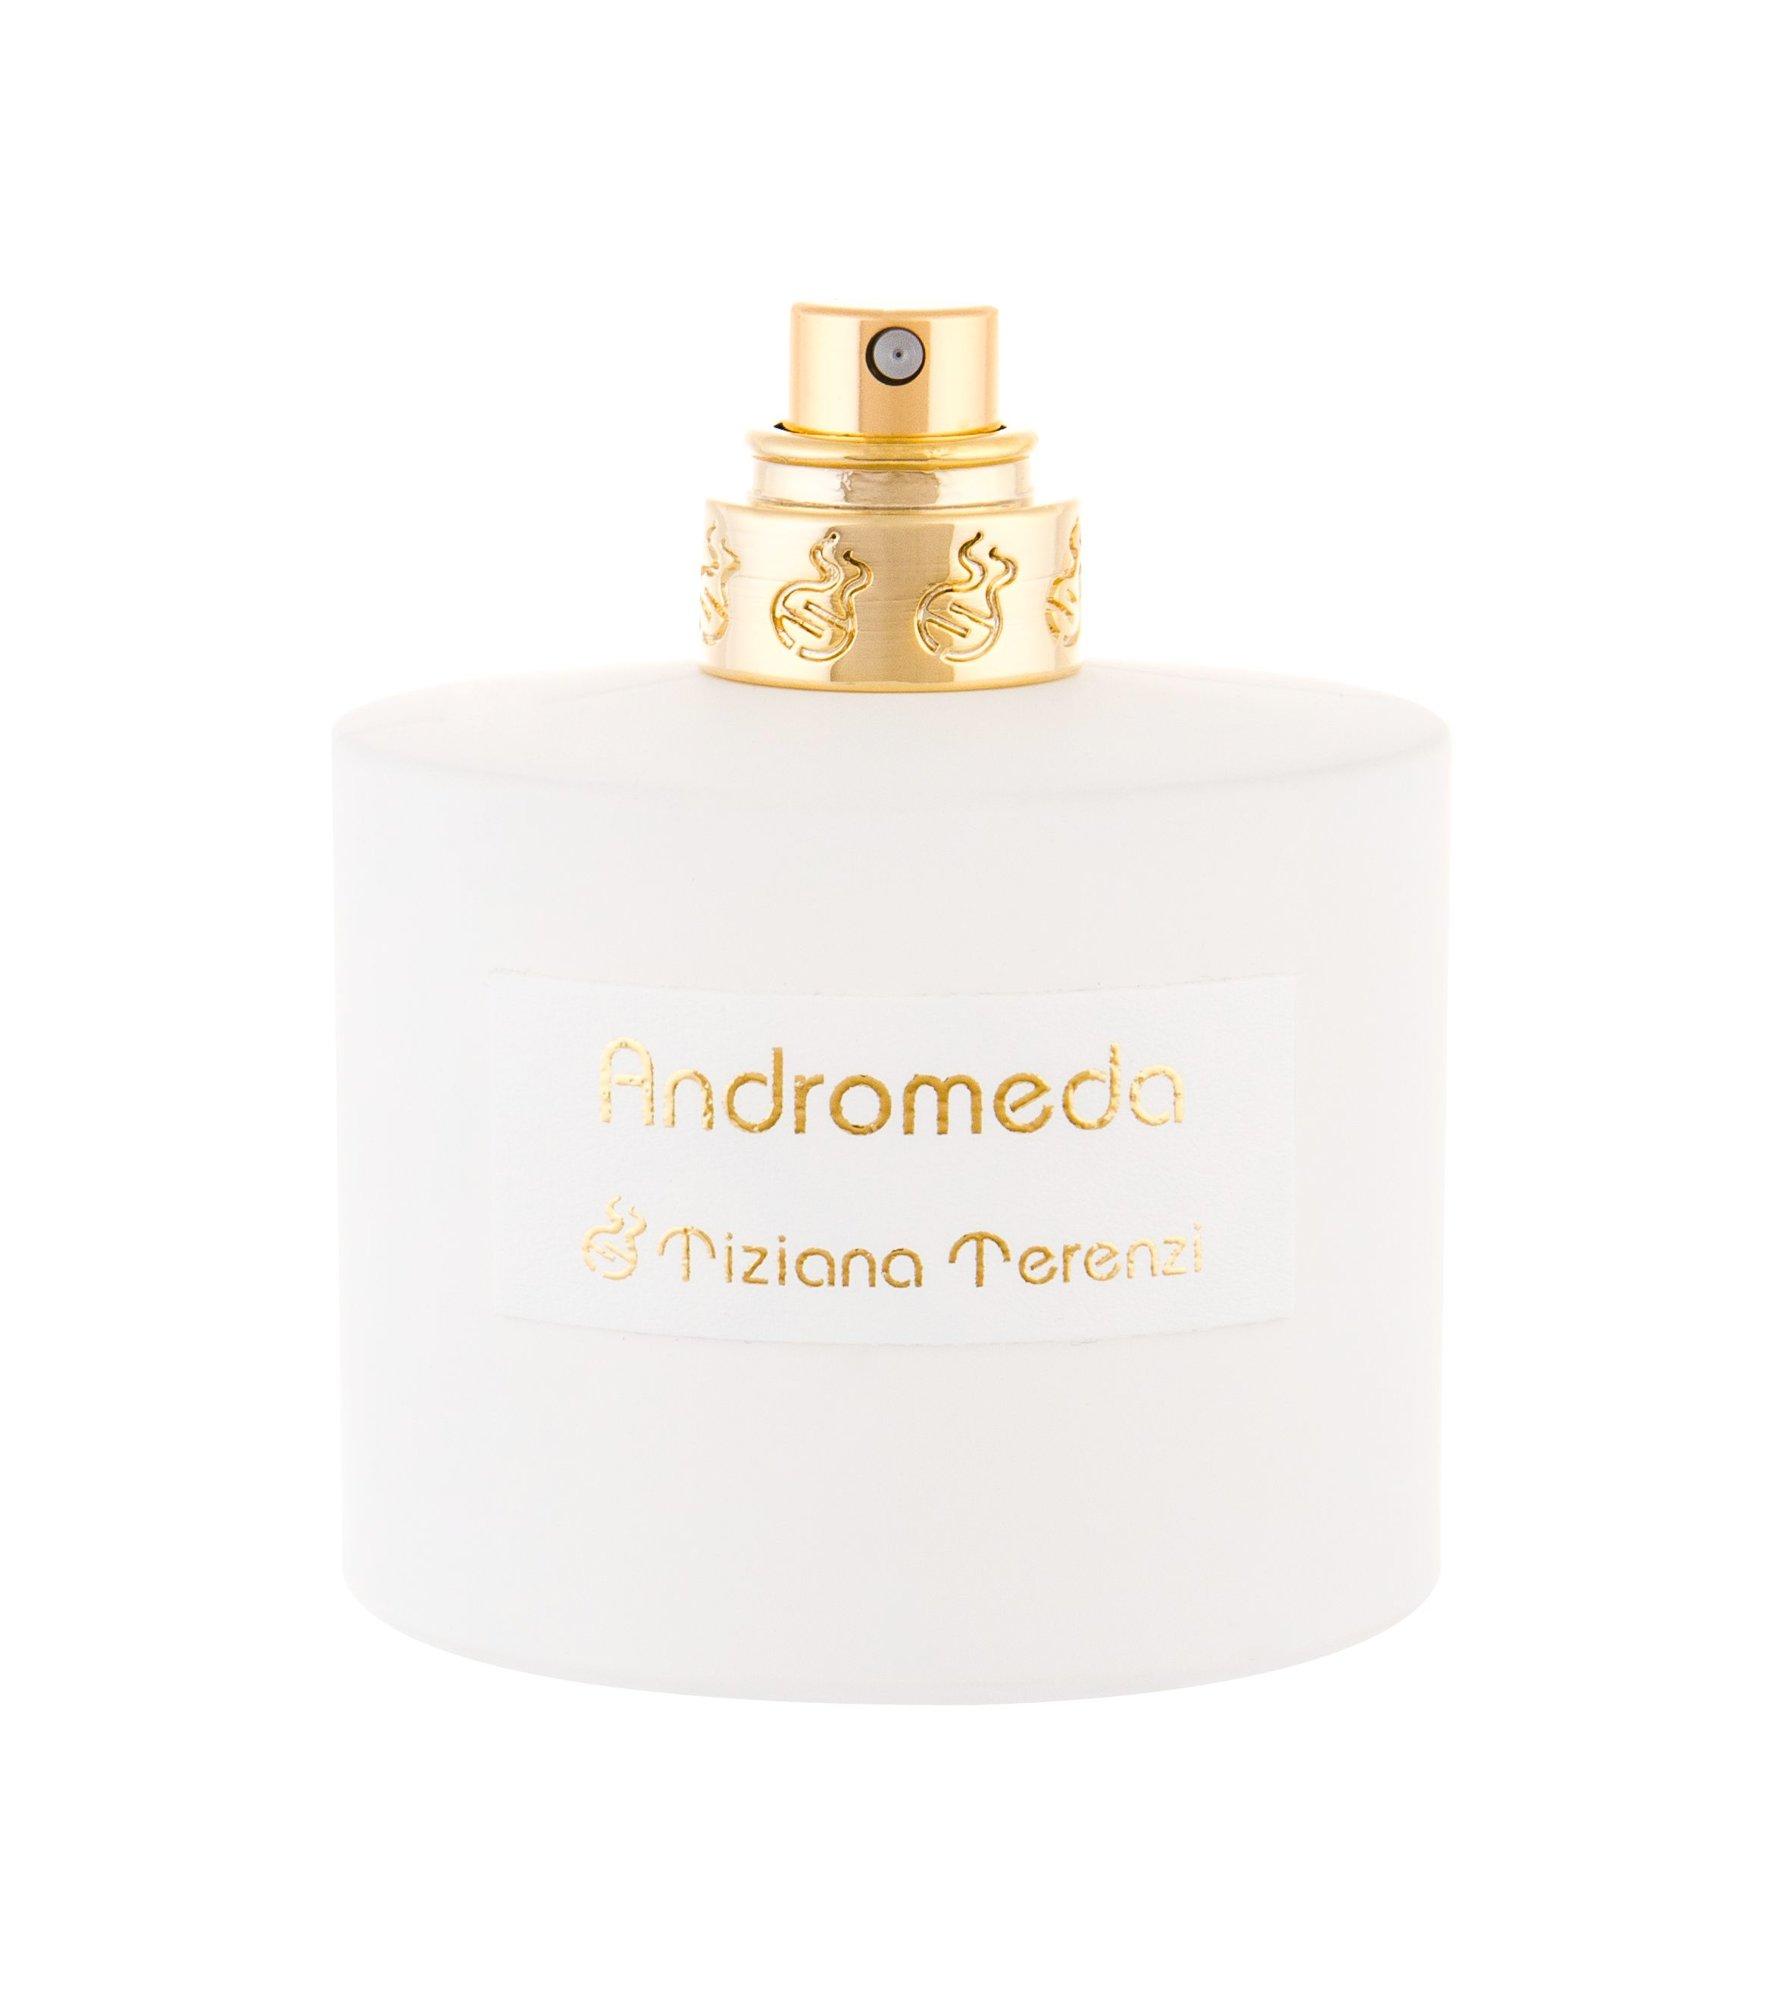 Tiziana Terenzi Luna Collection Andromeda Perfume 100ml